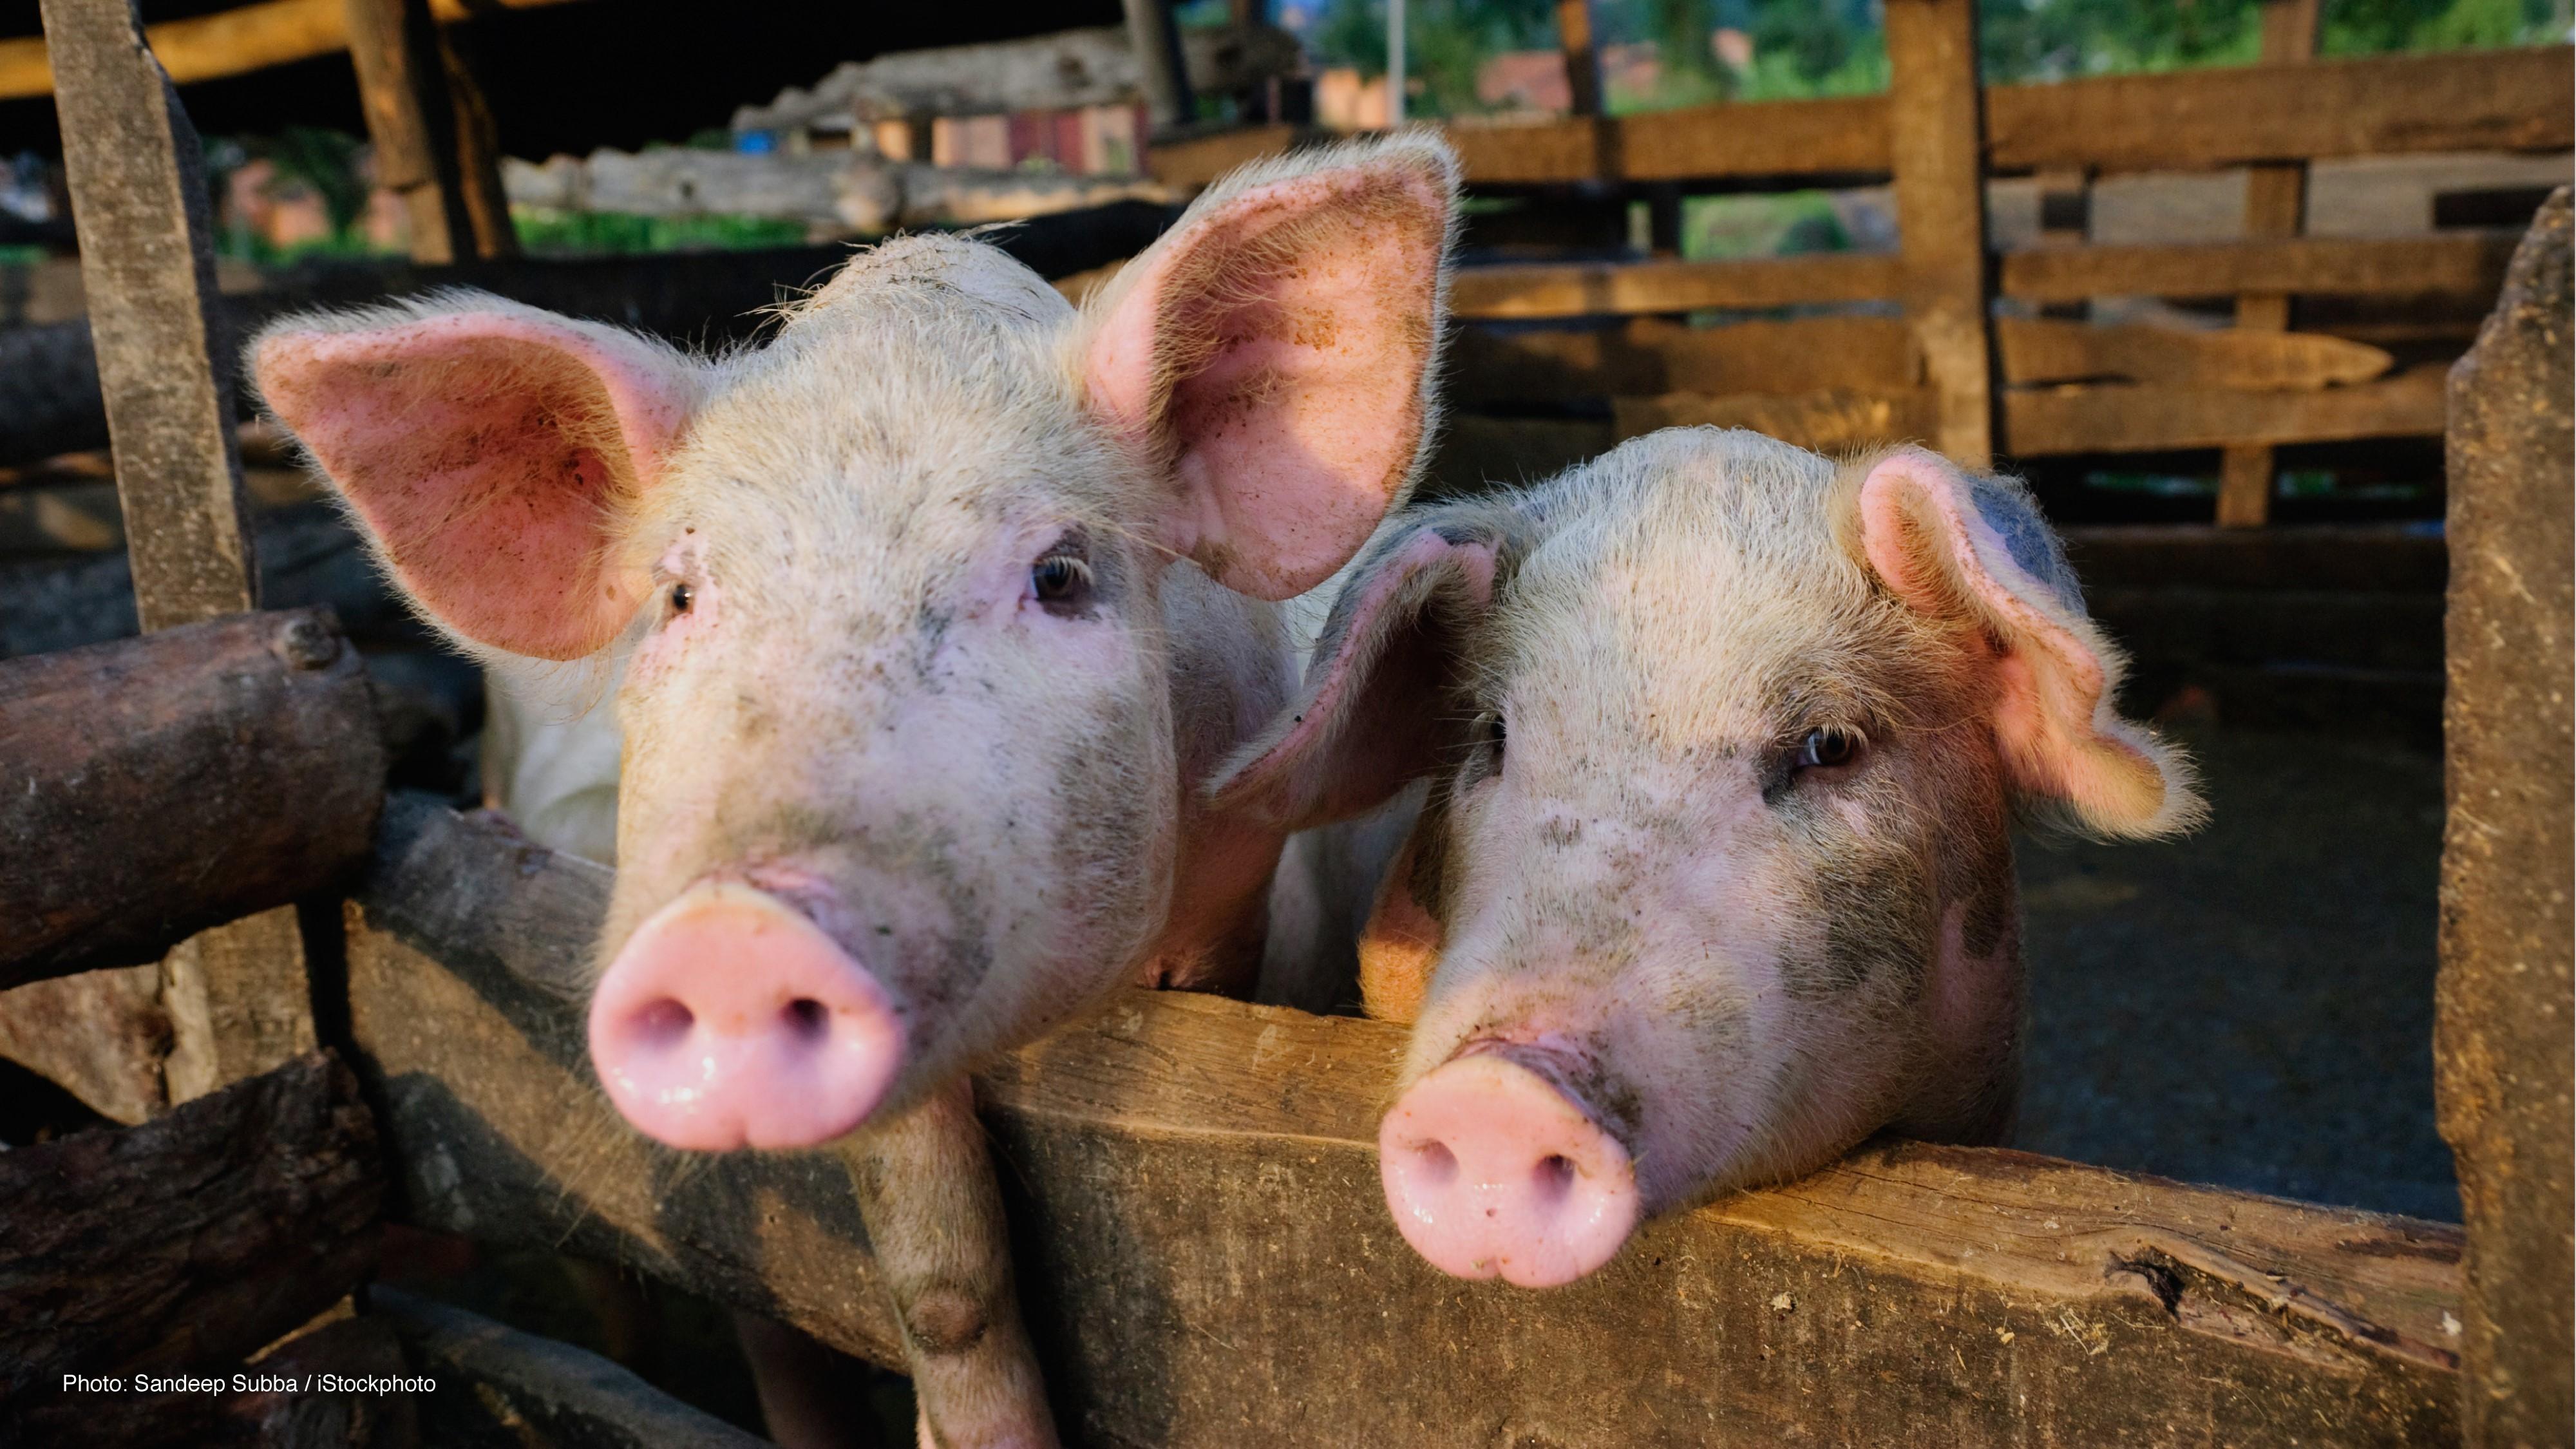 PCR on the farm: Raising healthy animals – miniPCR